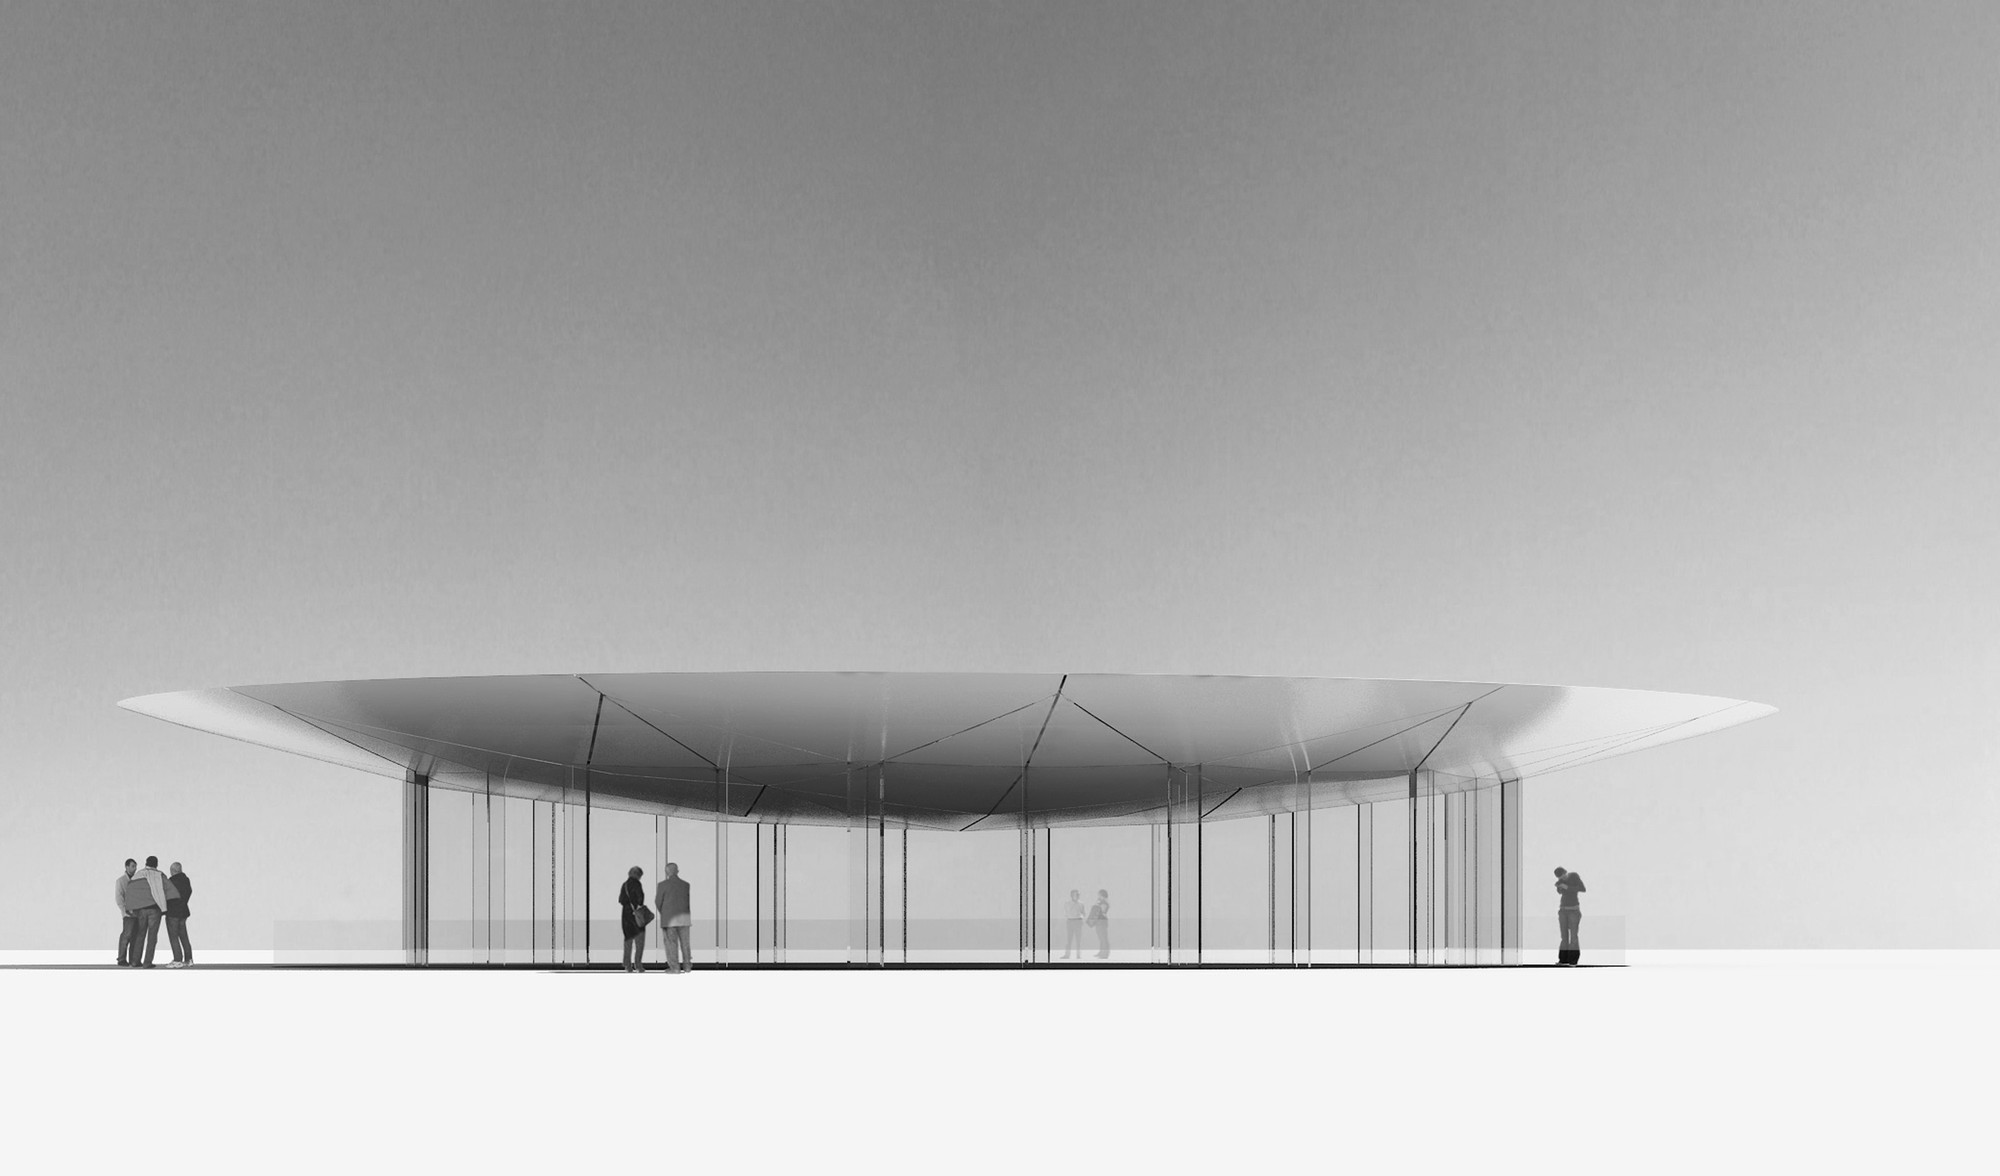 Glass Pavilion: un proyecto de Juan Herreros para la artista Mónica Fuster, Cortesia de Juan Herreros Arquitectos